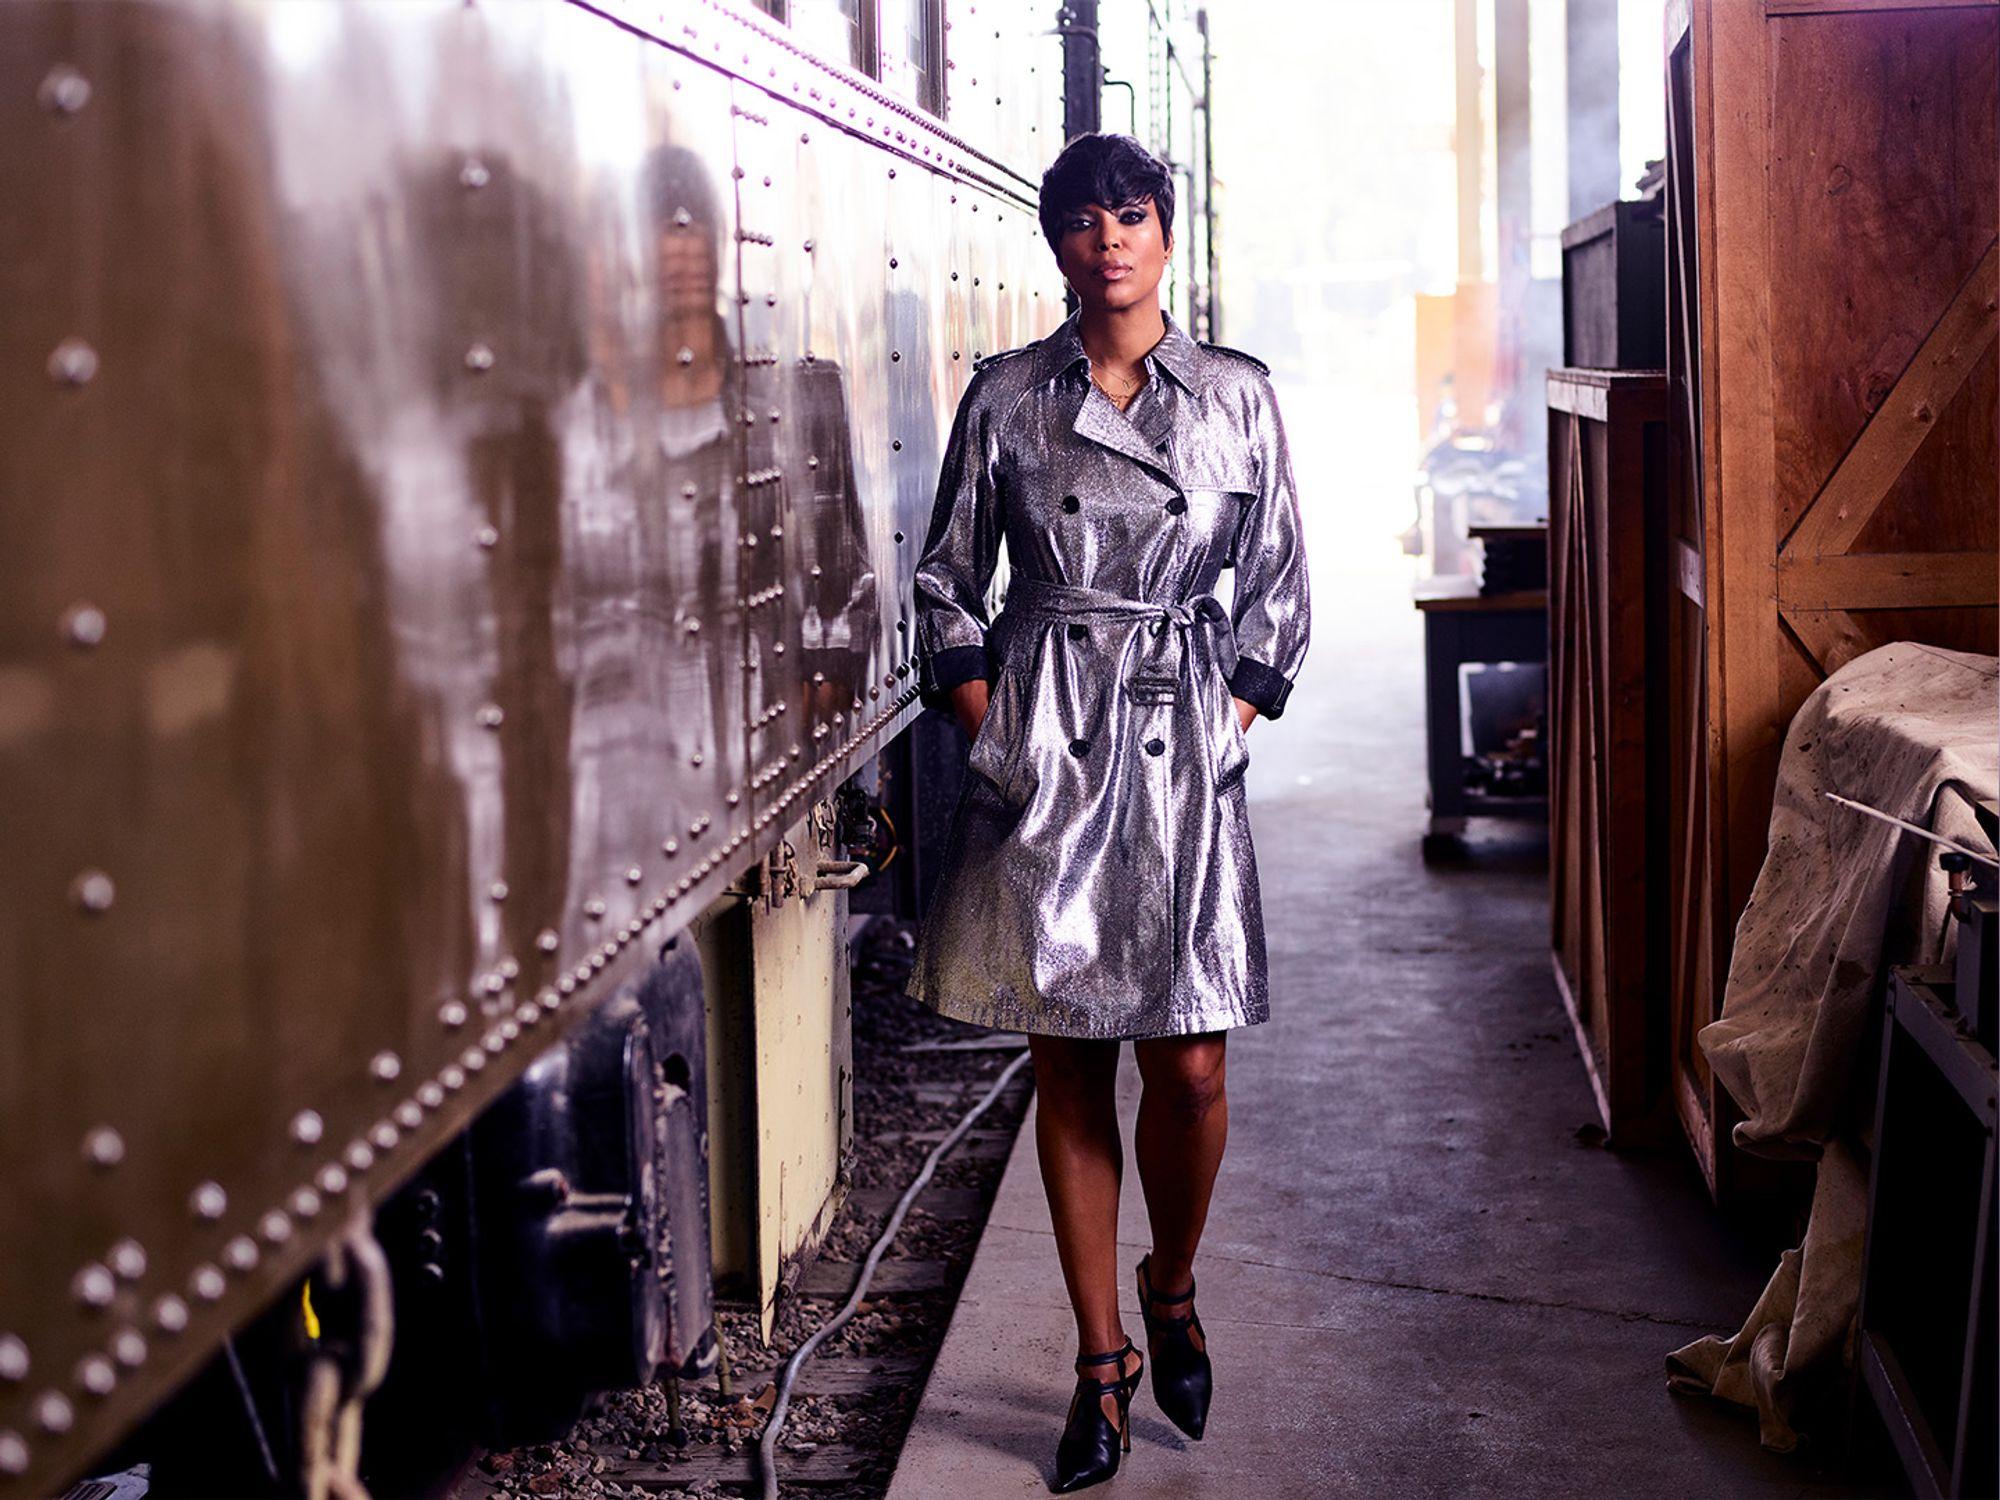 aisha tyler silver metallic trench coat